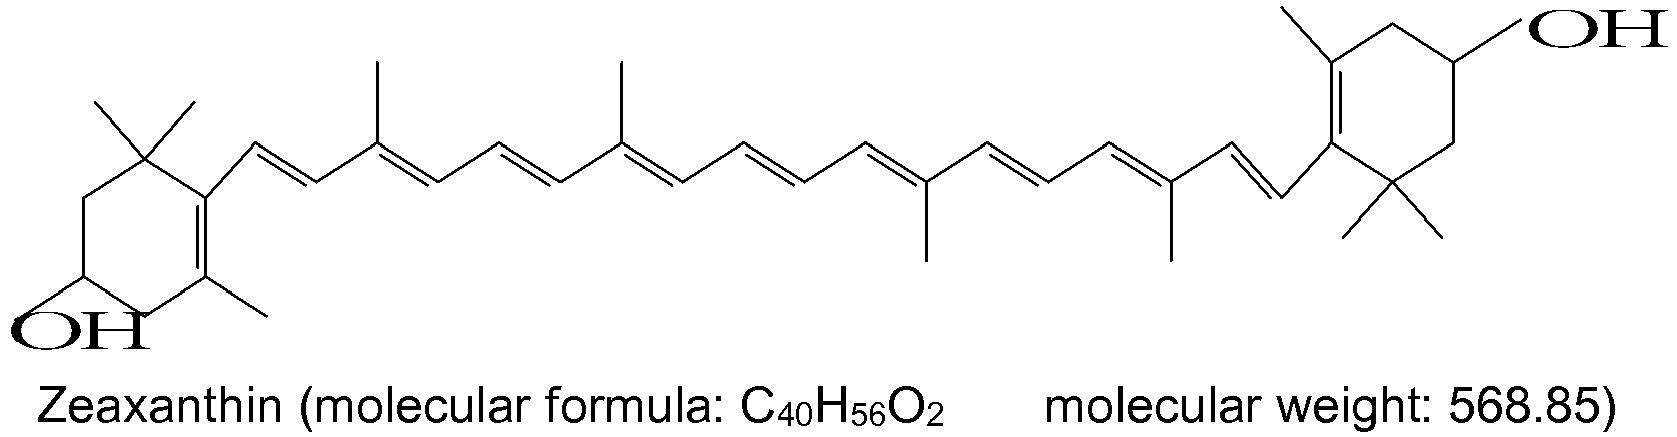 Patent EP252265... Xanthophyll Pigment